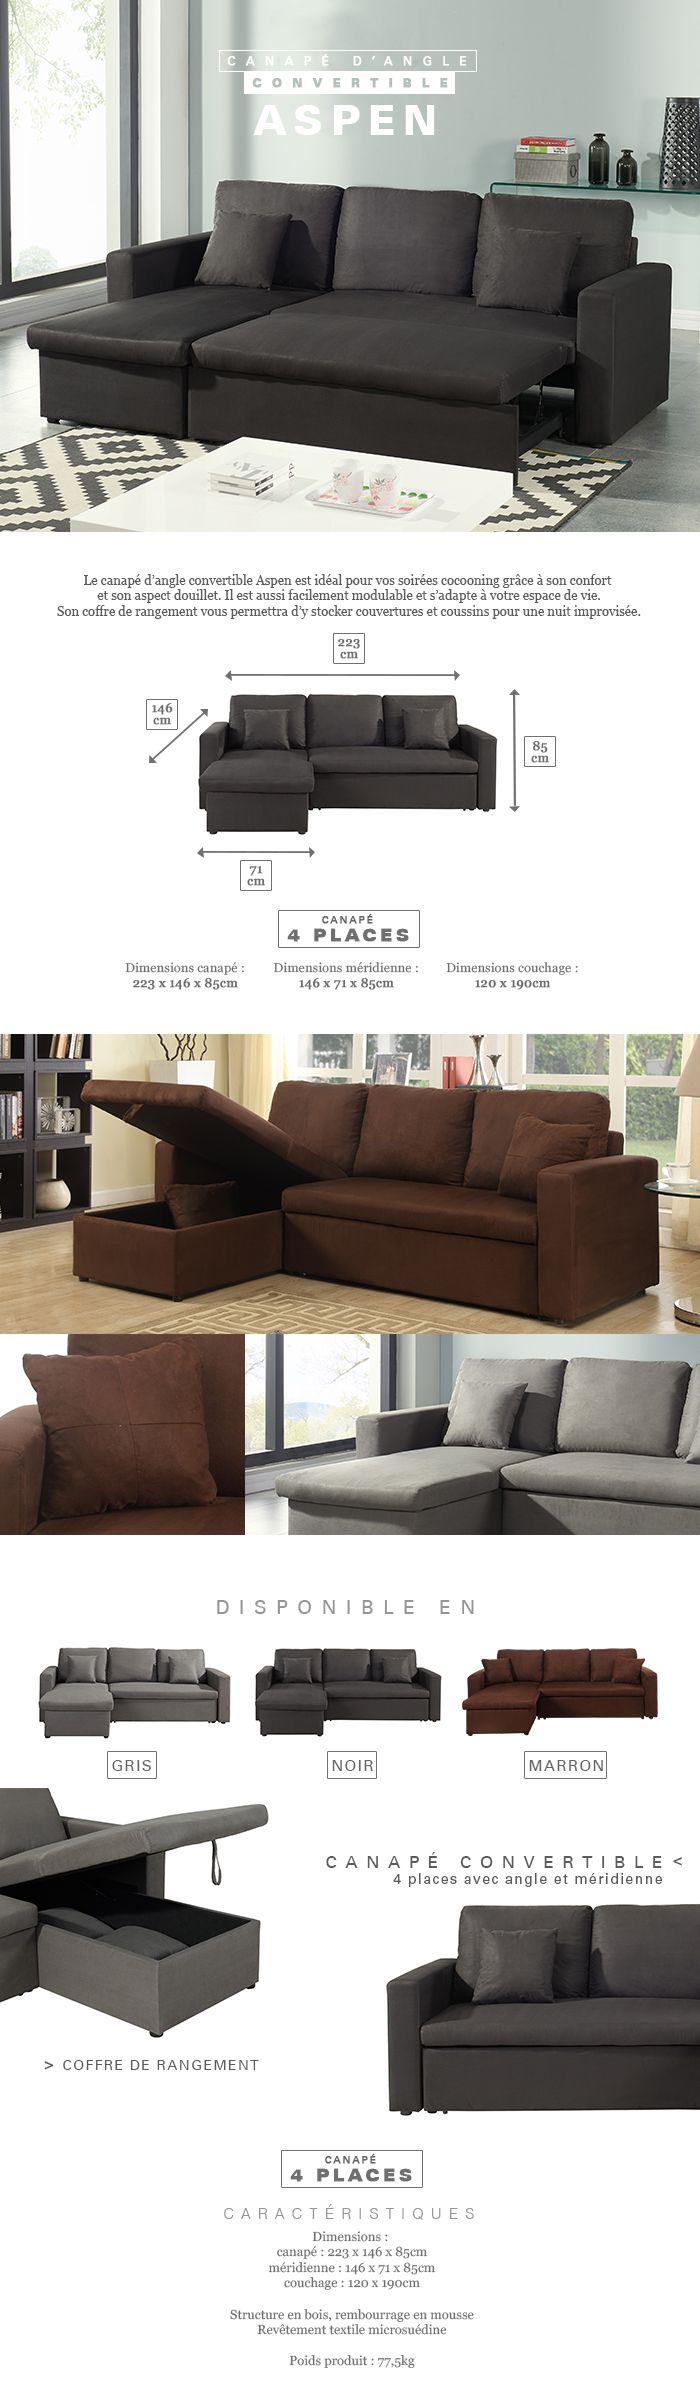 aspen canap d 39 angle r versible convertible 4 places tissu gris contemporain l 223 x p 146. Black Bedroom Furniture Sets. Home Design Ideas